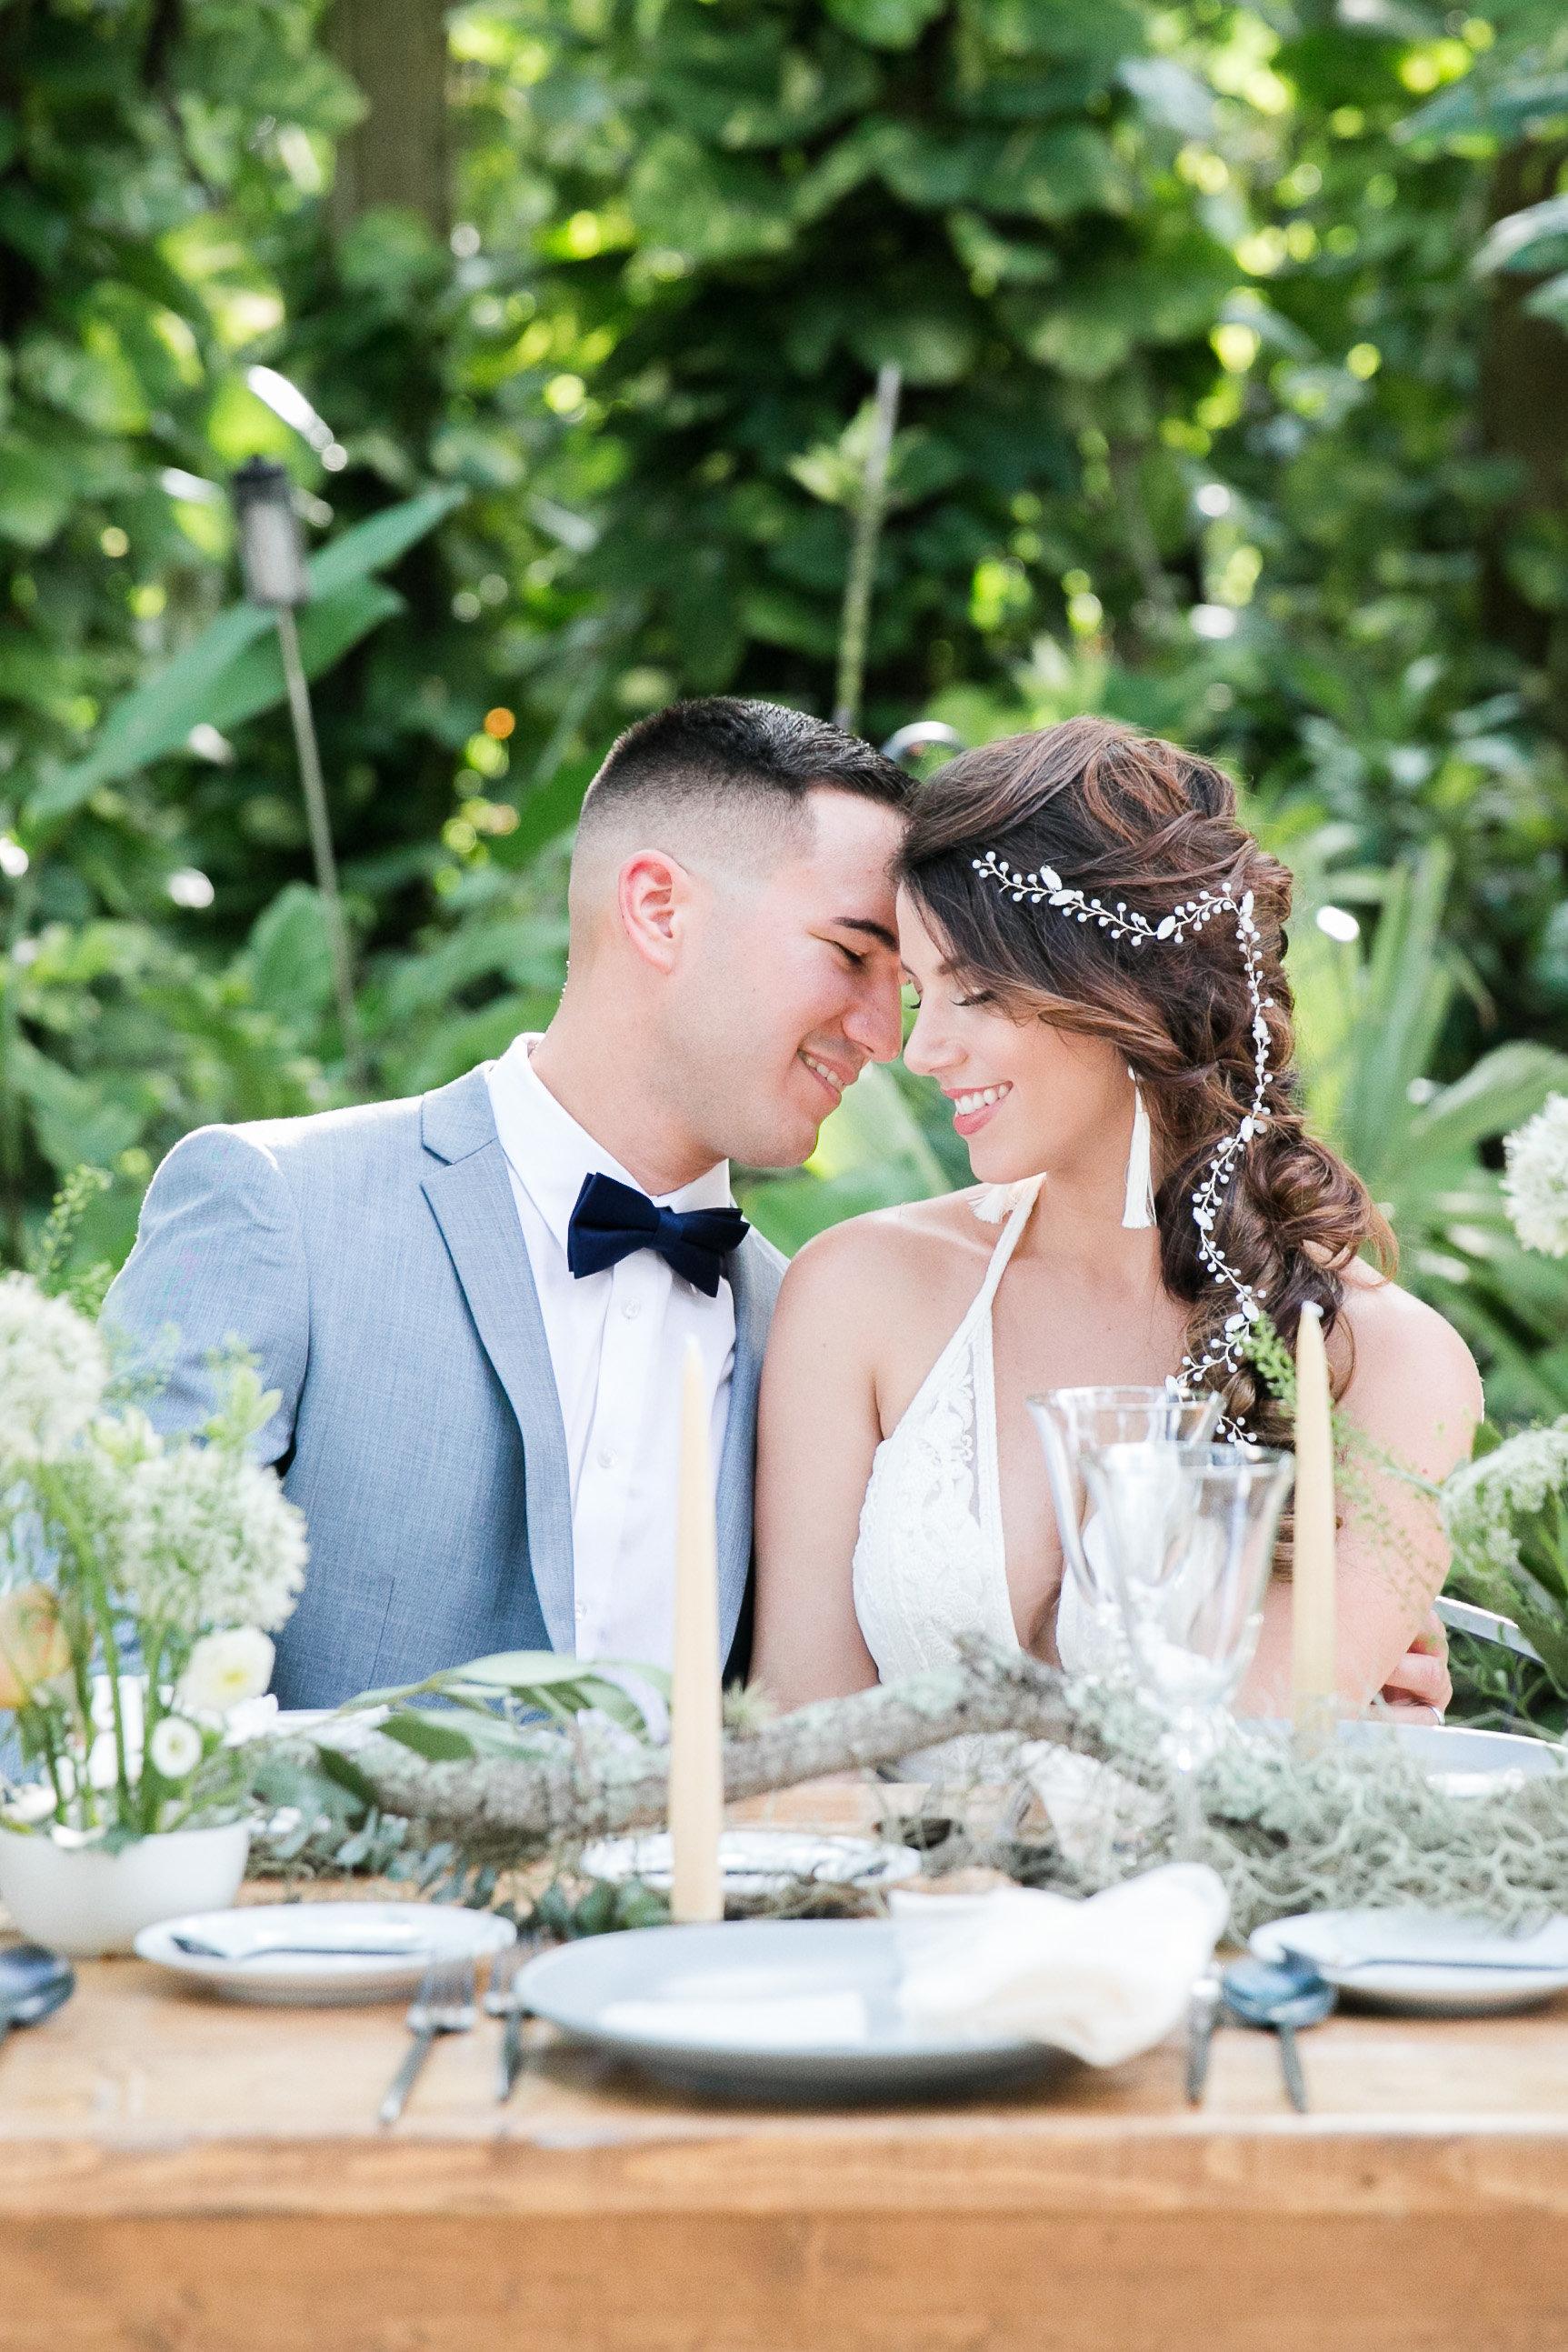 Walton House Wedding, White Opal hair vine, Boho Hair vine, White Crytal bridal Accessory, Champagne and GRIT - Copy.jpg